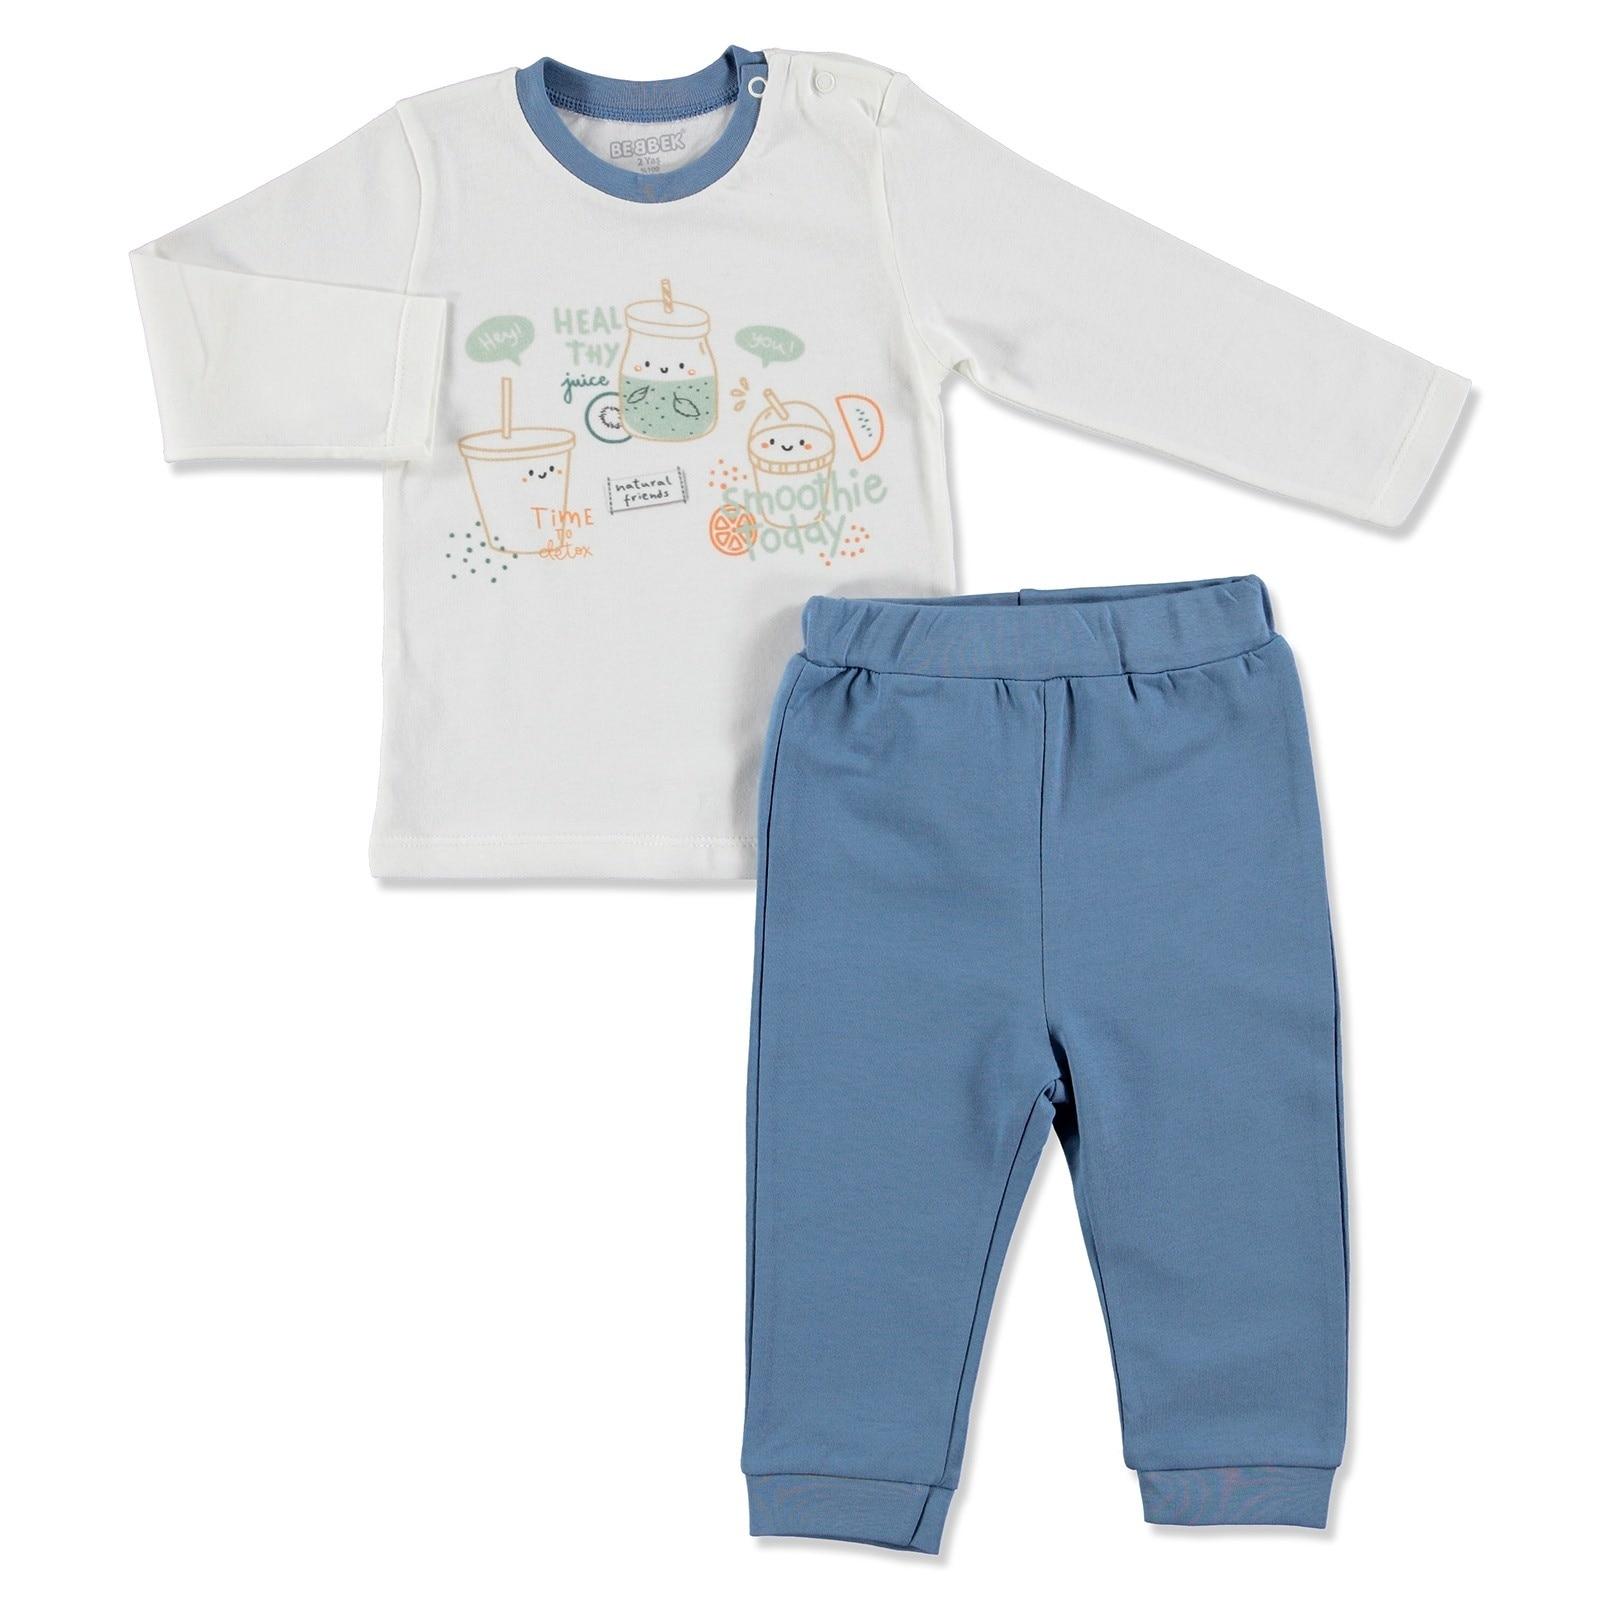 Ebebek Bebbek Summer Baby Boy Natural Sweatshirt Pant 2 Pcs Set